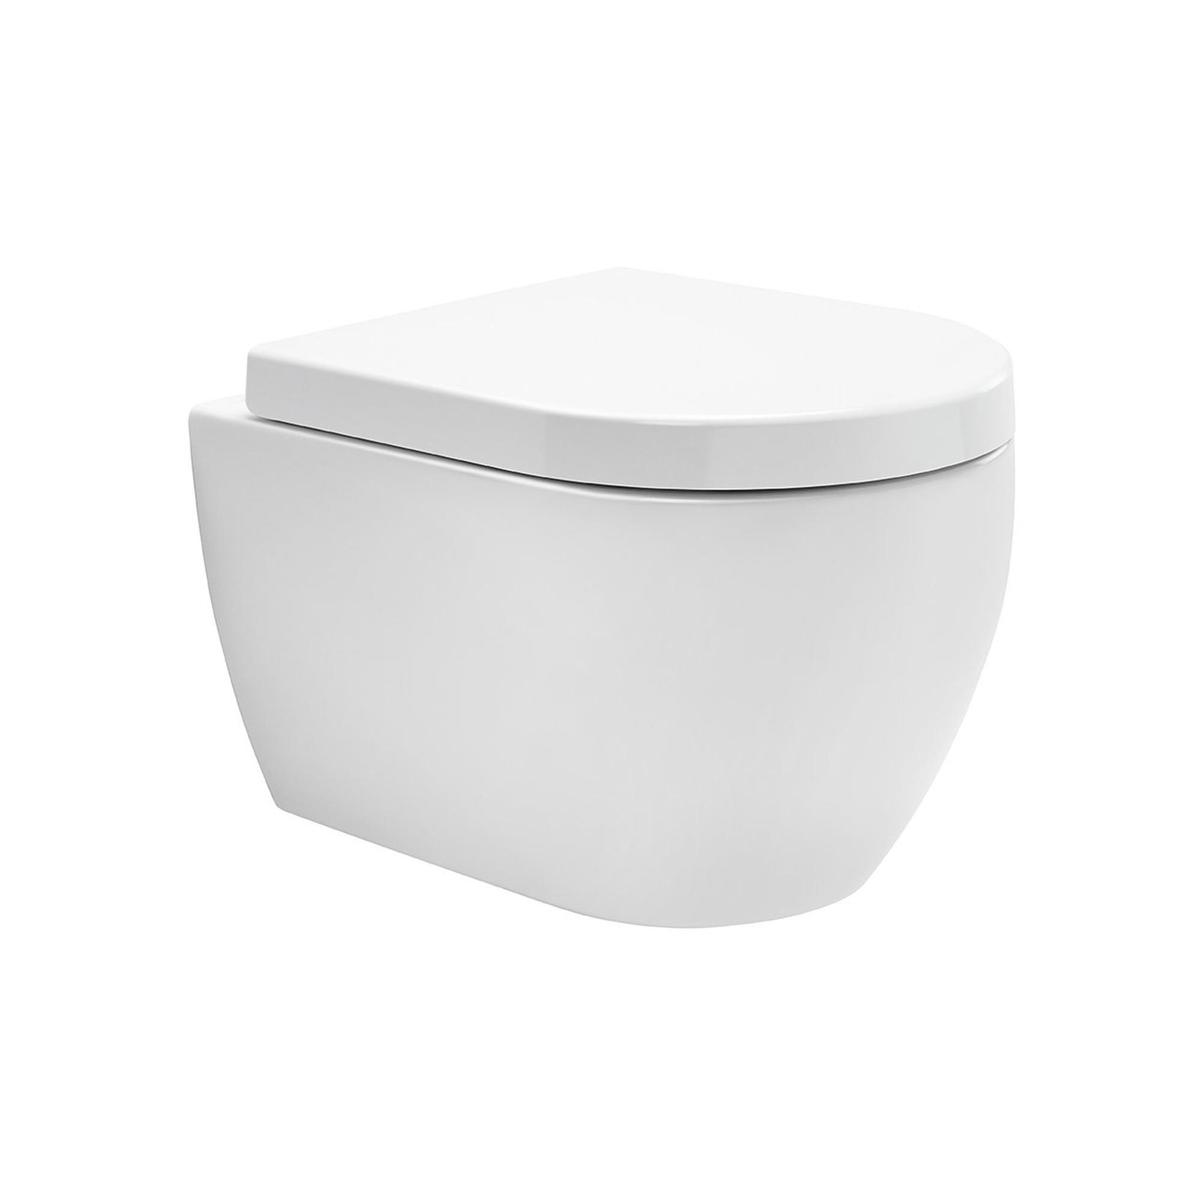 851a6800a56da8 Verkorte Toiletpot 45 Cm